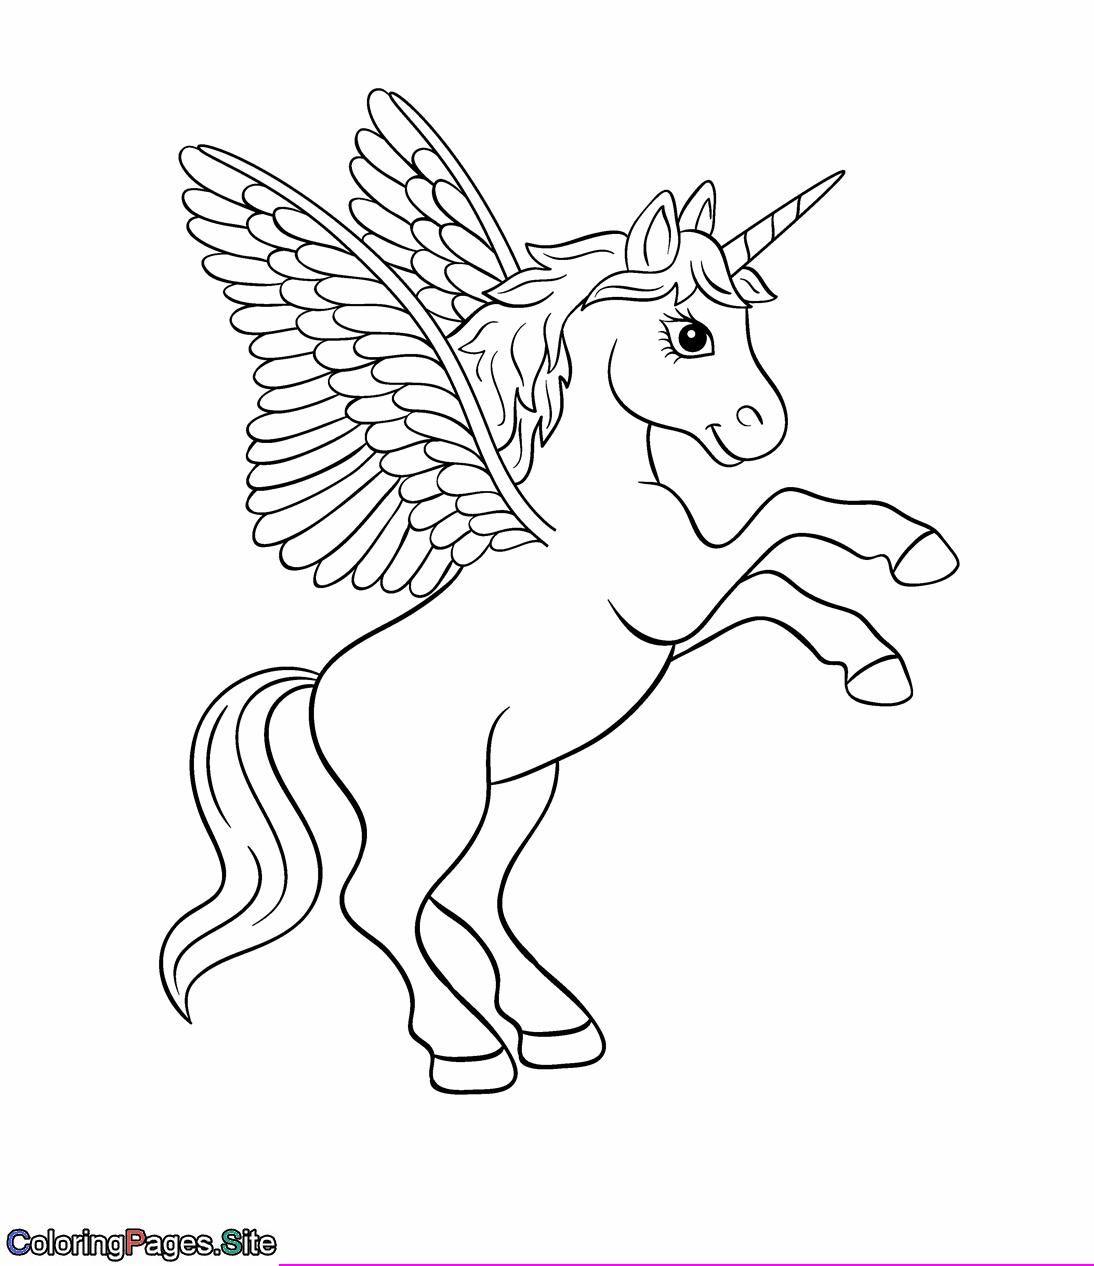 16 Unicorn Coloring Page In 2020 Unicorn Coloring Pages Unicorn